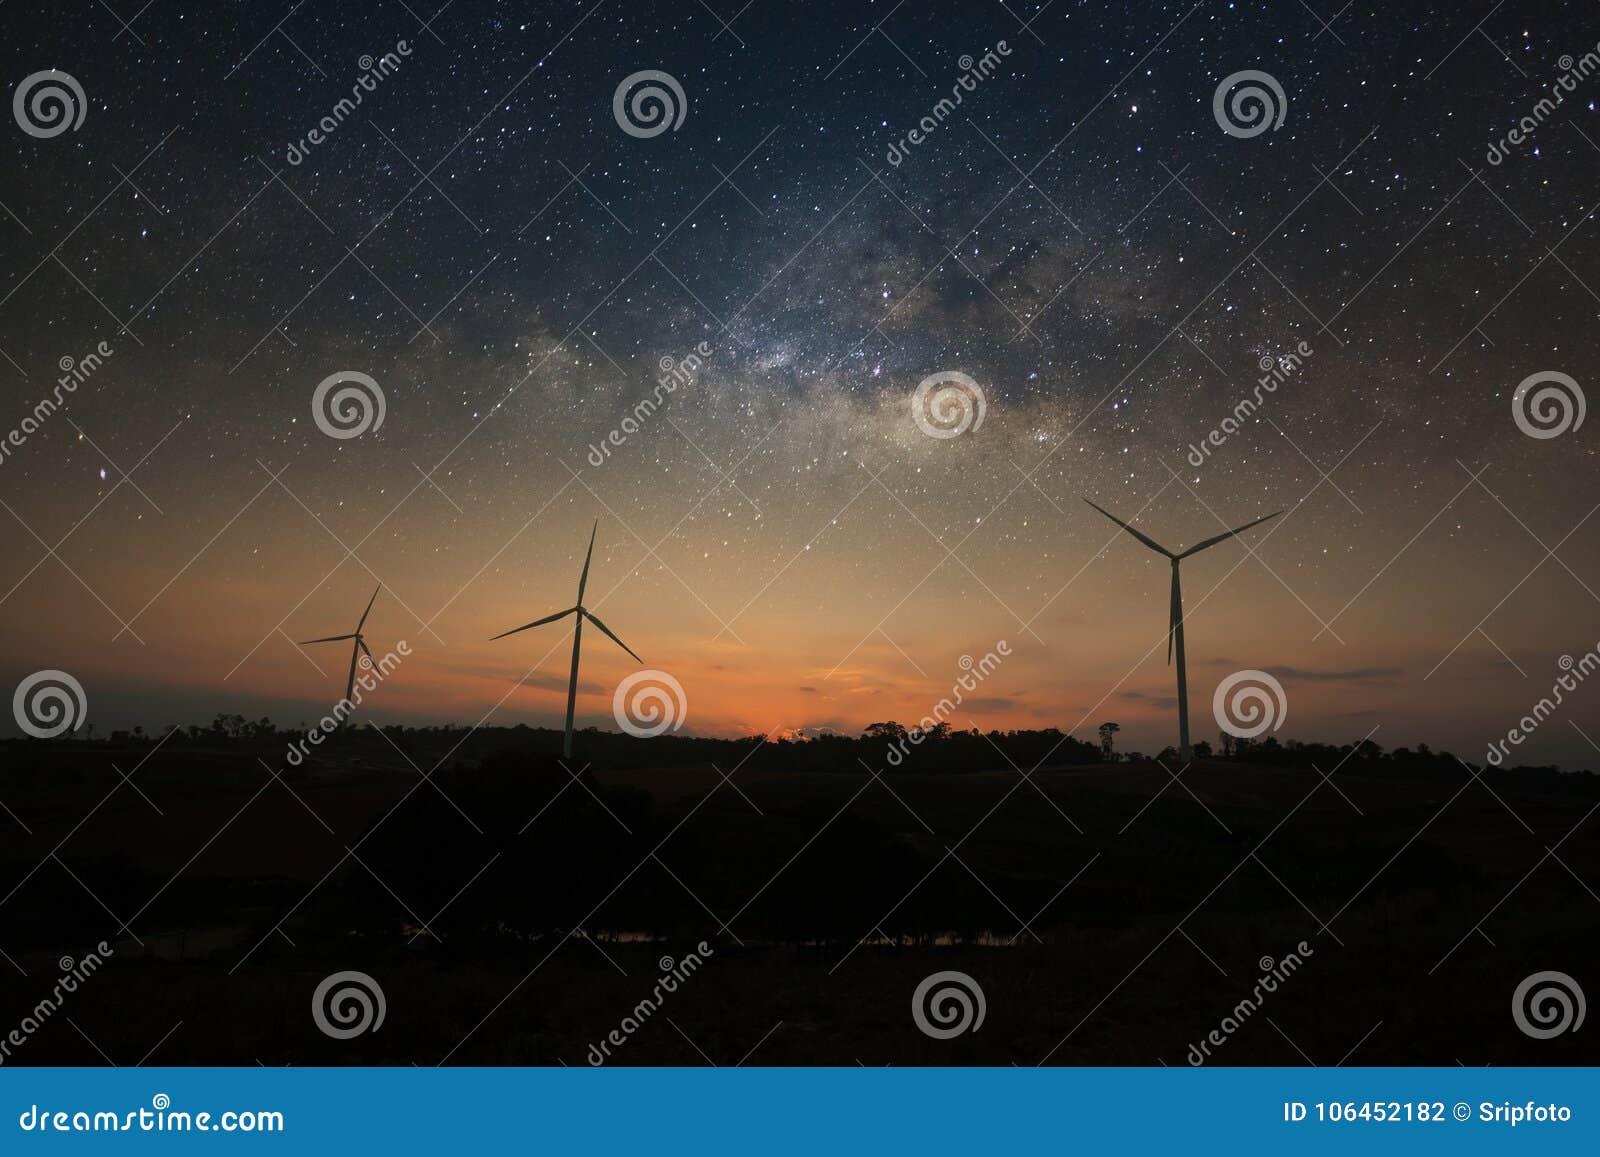 Galáxia da Via Látea sobre a energia limpa da turbina eólica